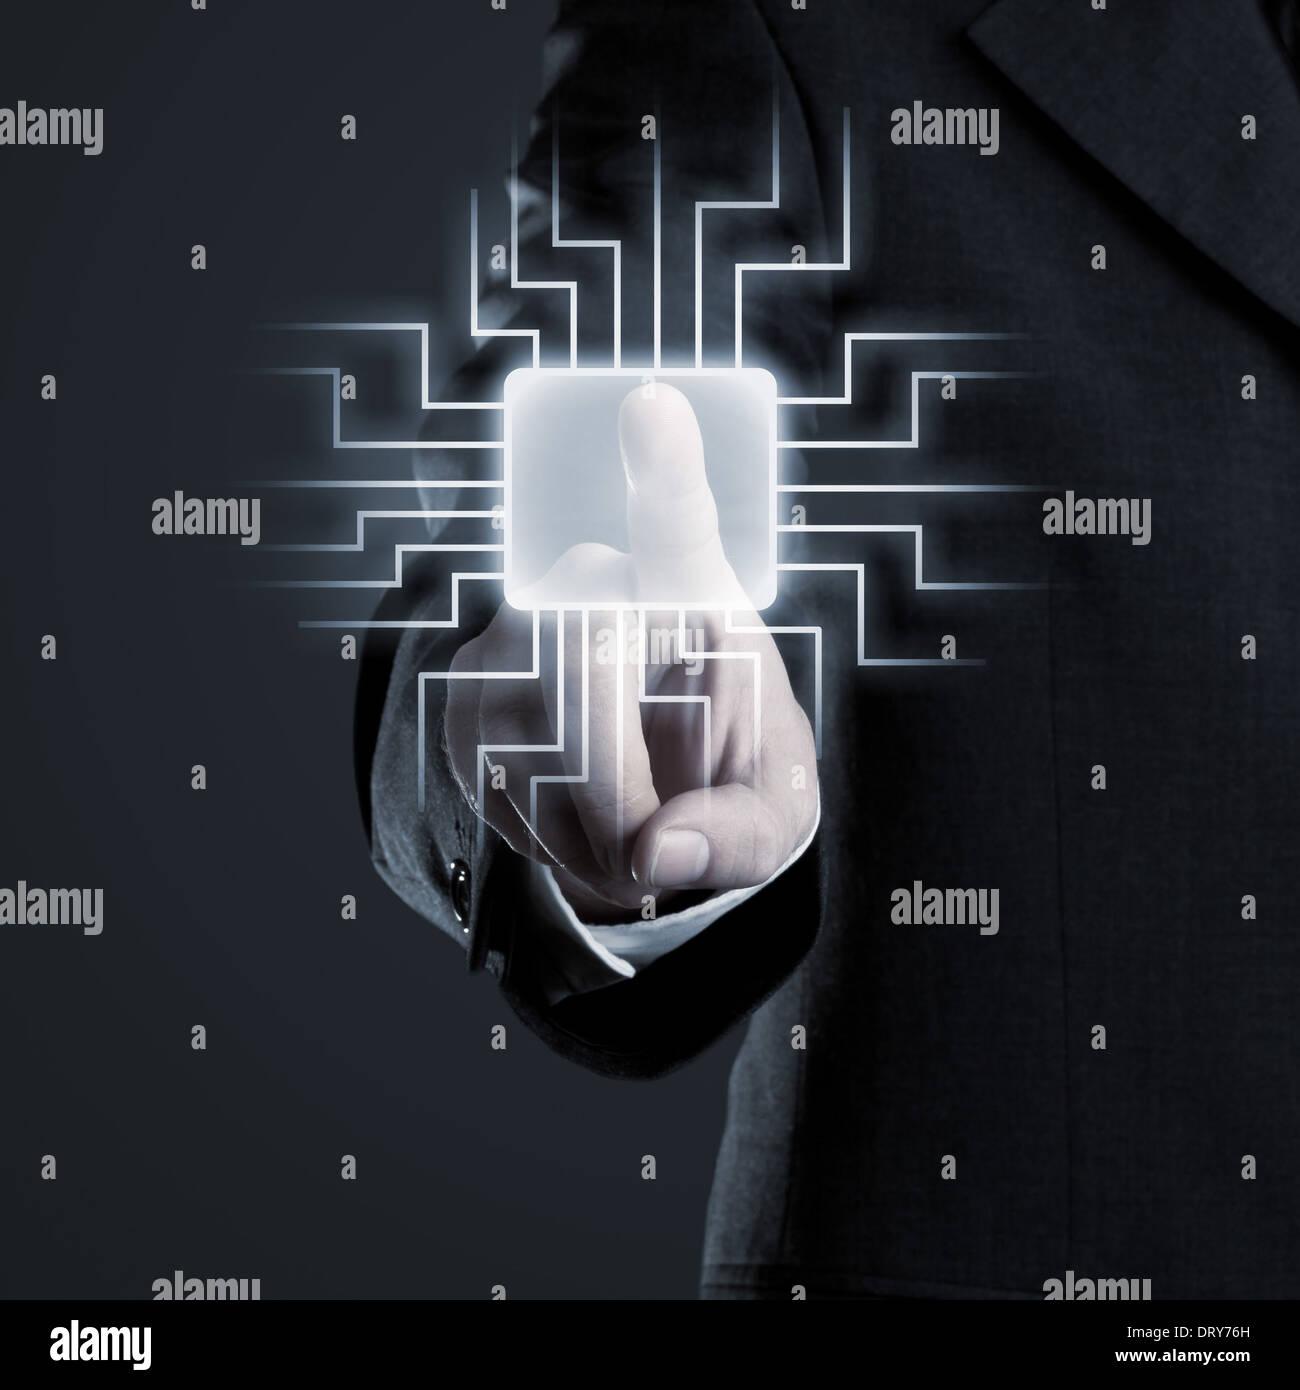 Empresario navegar la red sobre pantalla táctil futurista Imagen De Stock